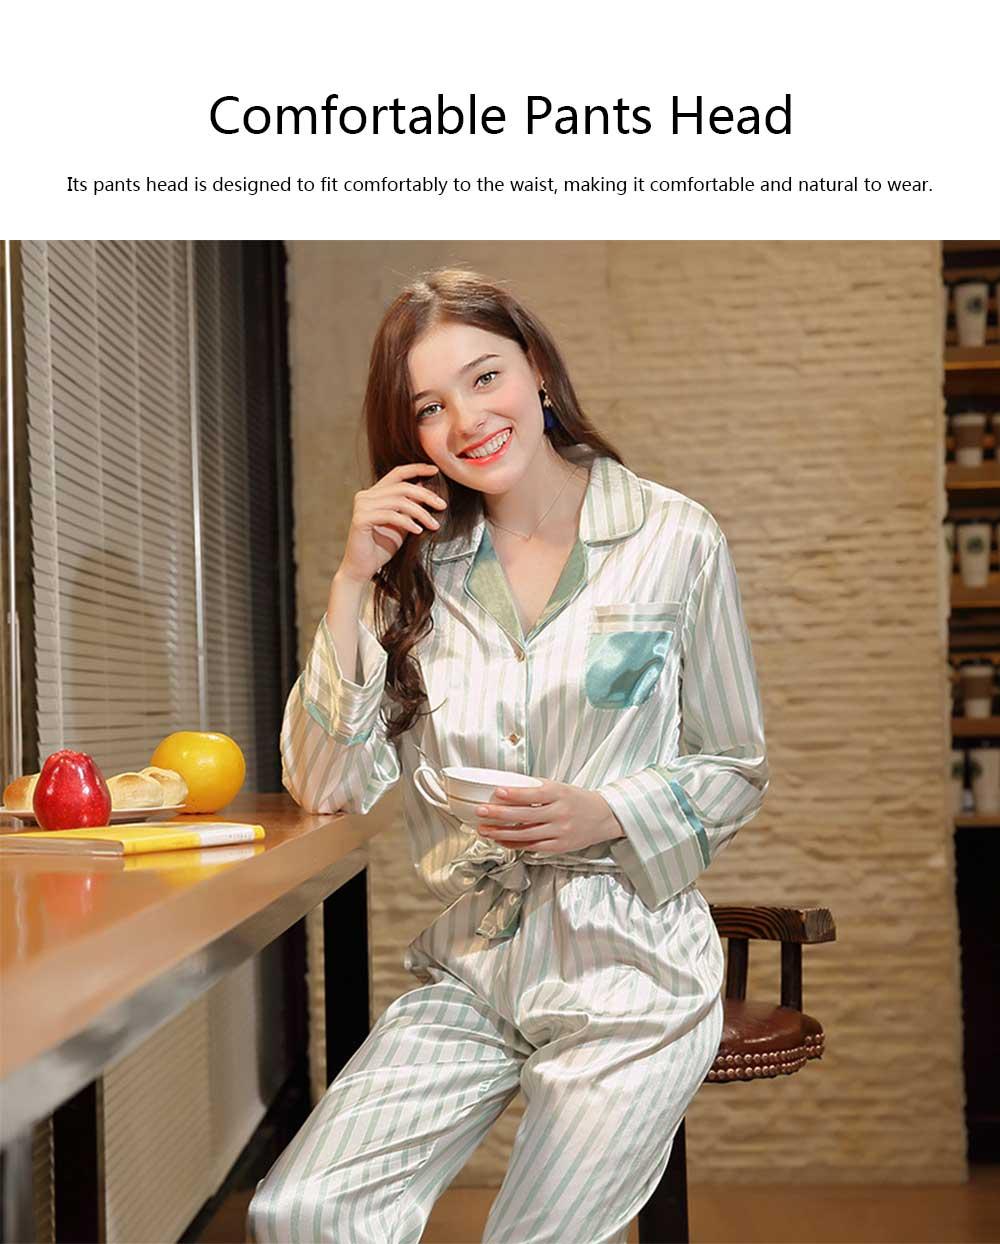 Imitation Silk Fabric Long-sleeved Pajamas set, Classic Lapel Fashion Casual Striped Tracksuit, Spring and Autumn 2019 3